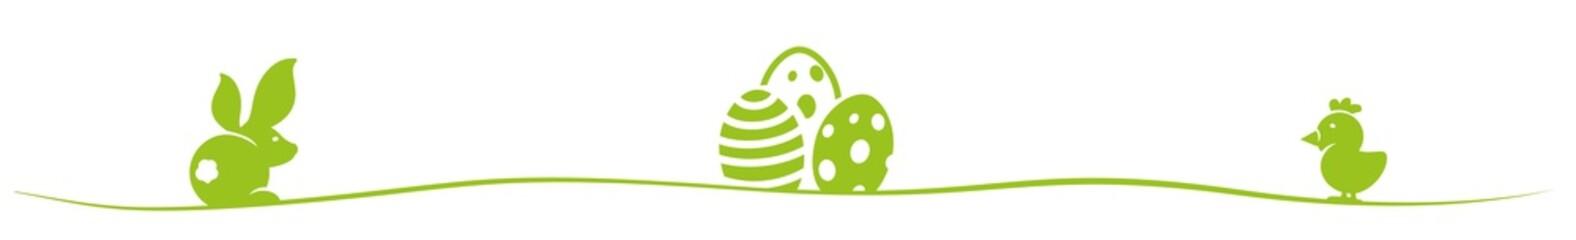 Osterhase Ostereier Osterkücken grün